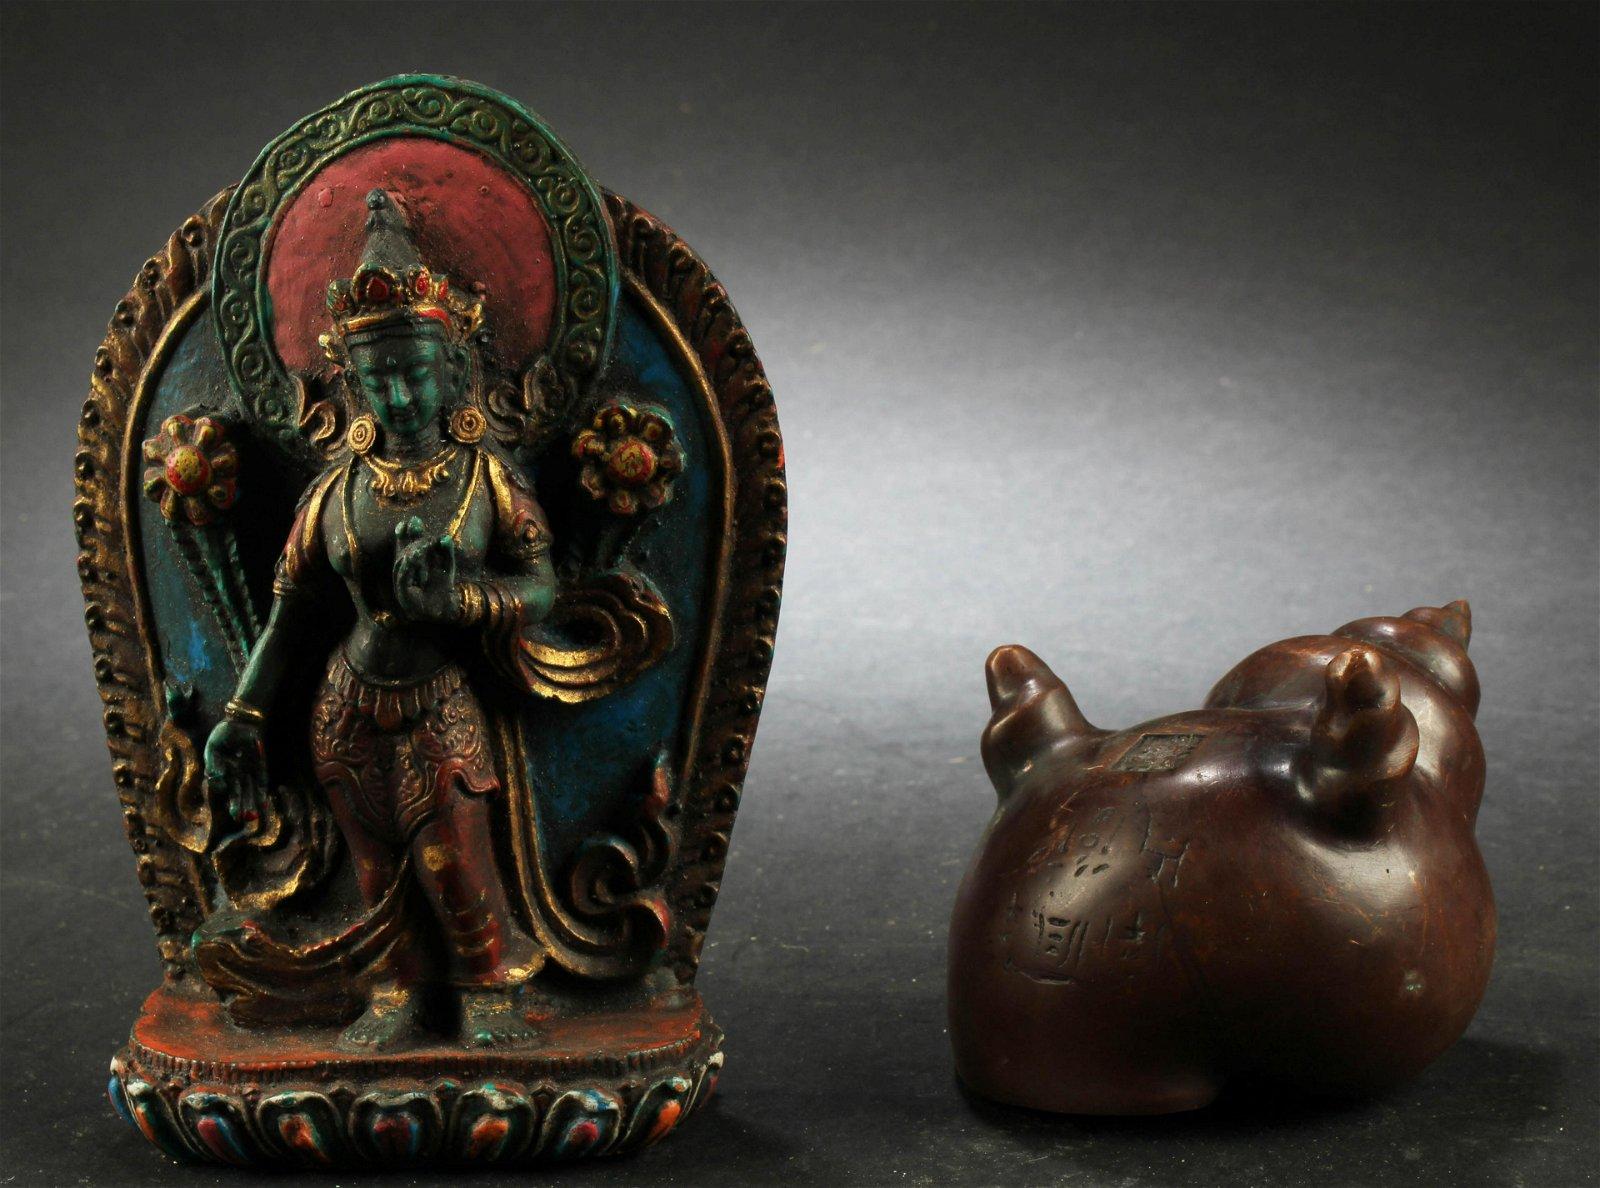 One Bronze Buddha Statue & One Bronze Censer